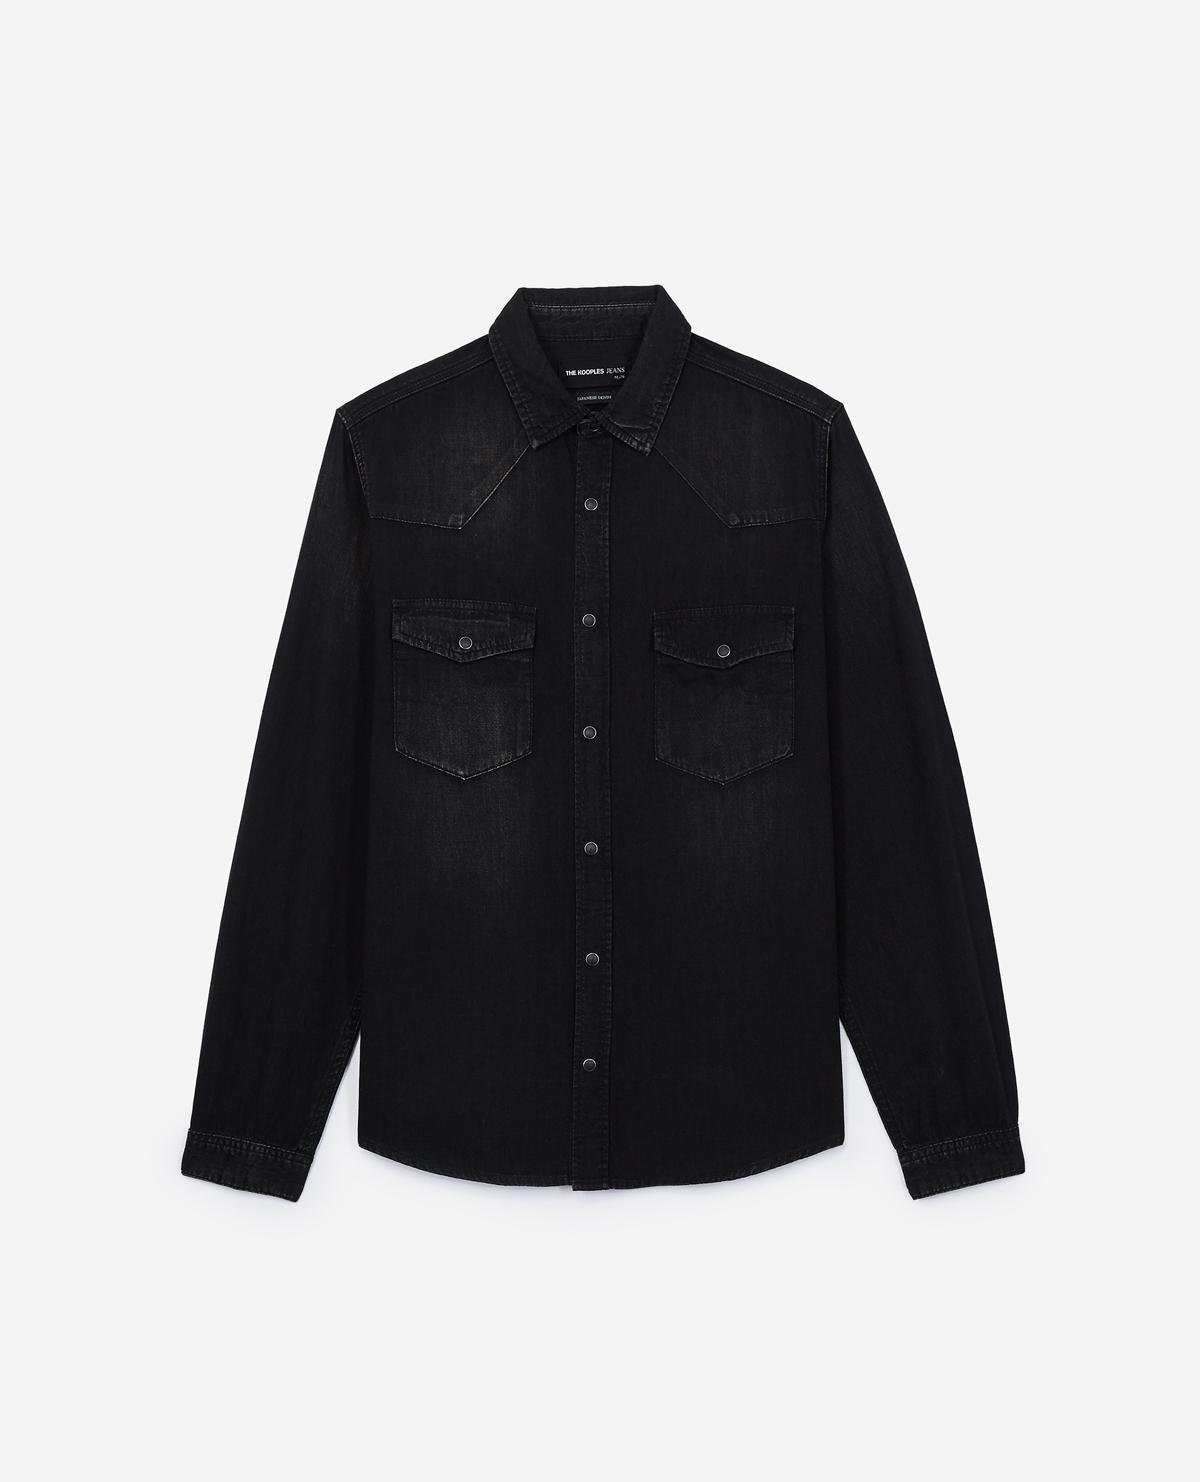 4ba098a69f Lyst - The Kooples Black Japanese Denim Shirt in Blue for Men